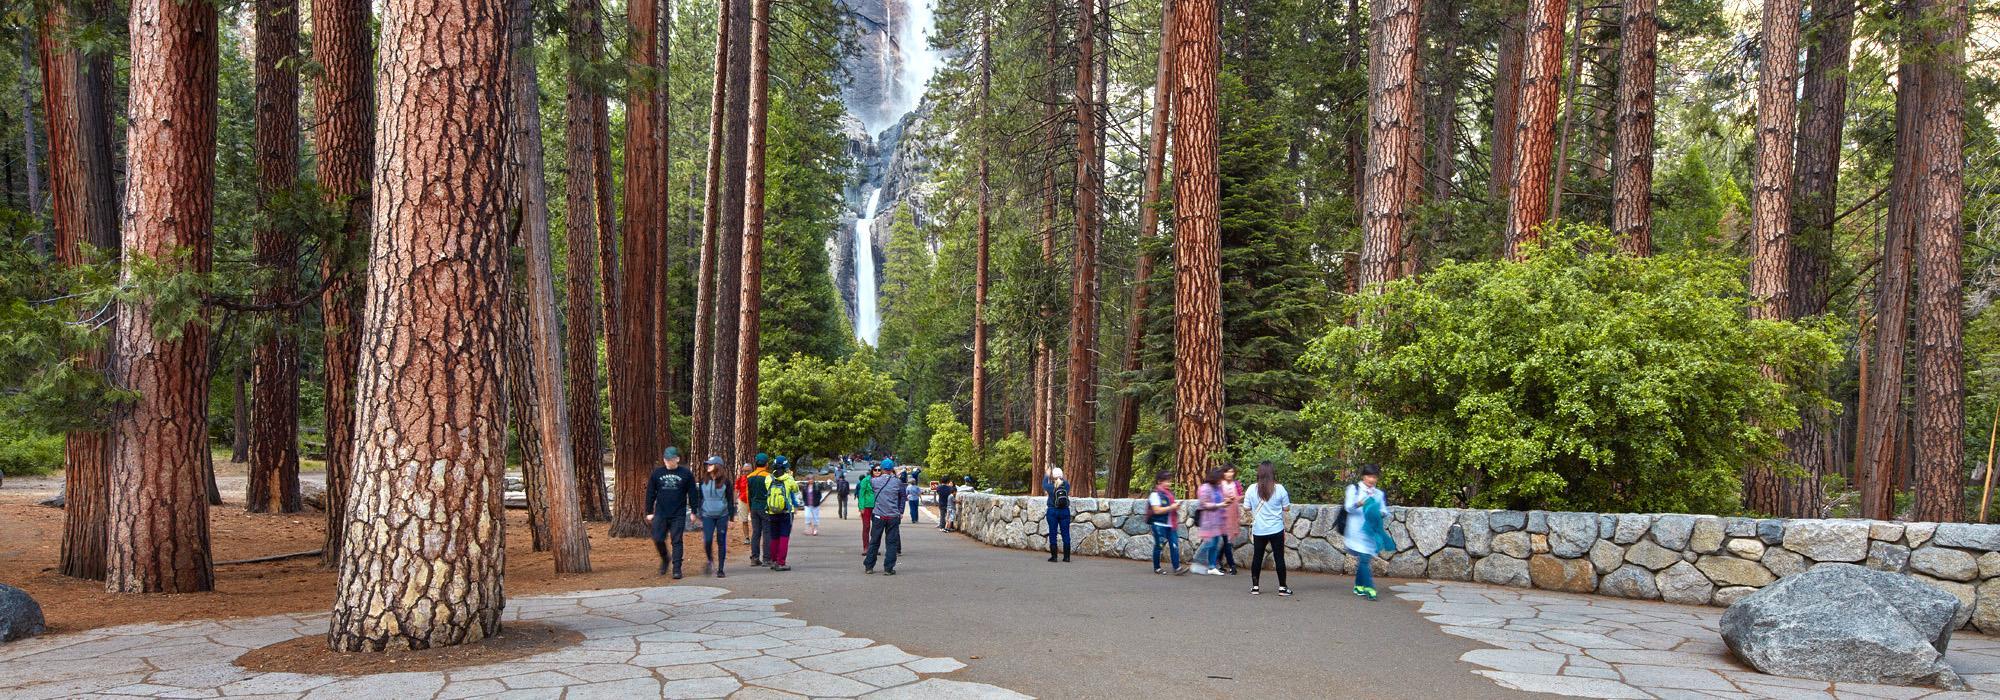 CA_YosemiteFallsCorridor_byPhillipBond_2016_Hero.jpg